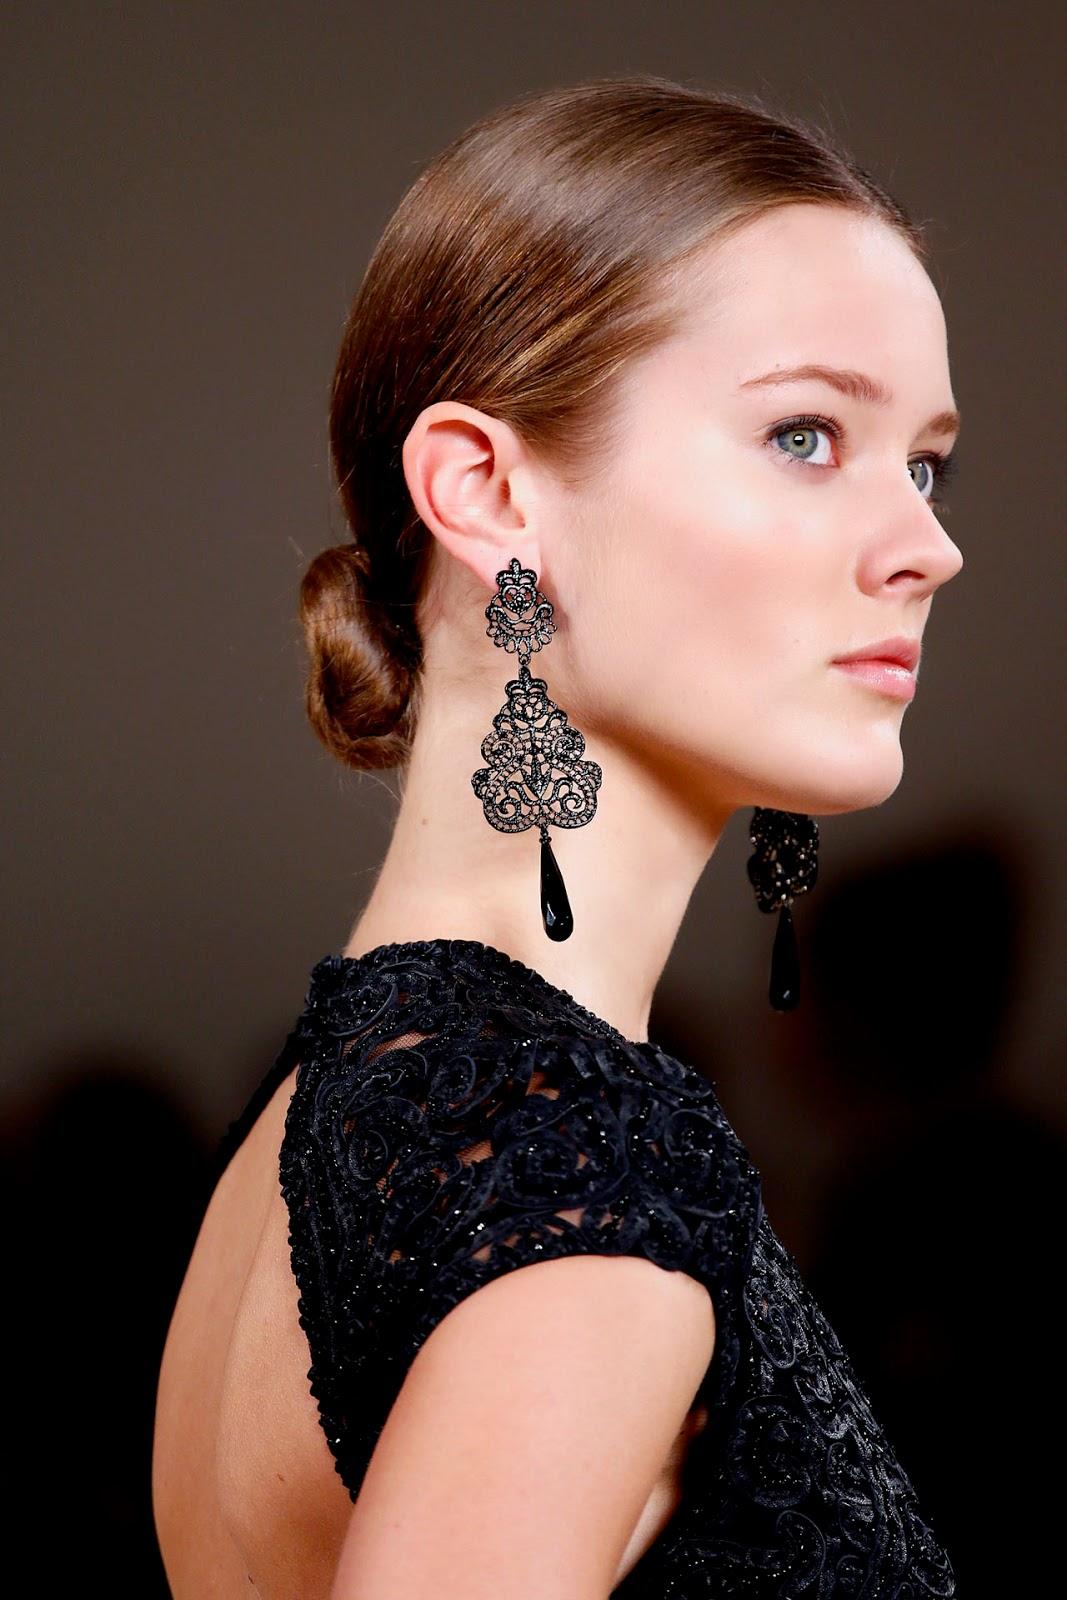 Súper fácil peinados con pelo liso Imagen de cortes de pelo consejos - Moda Cabellos: Elegantes peinados recogidos con pelo lacio ...